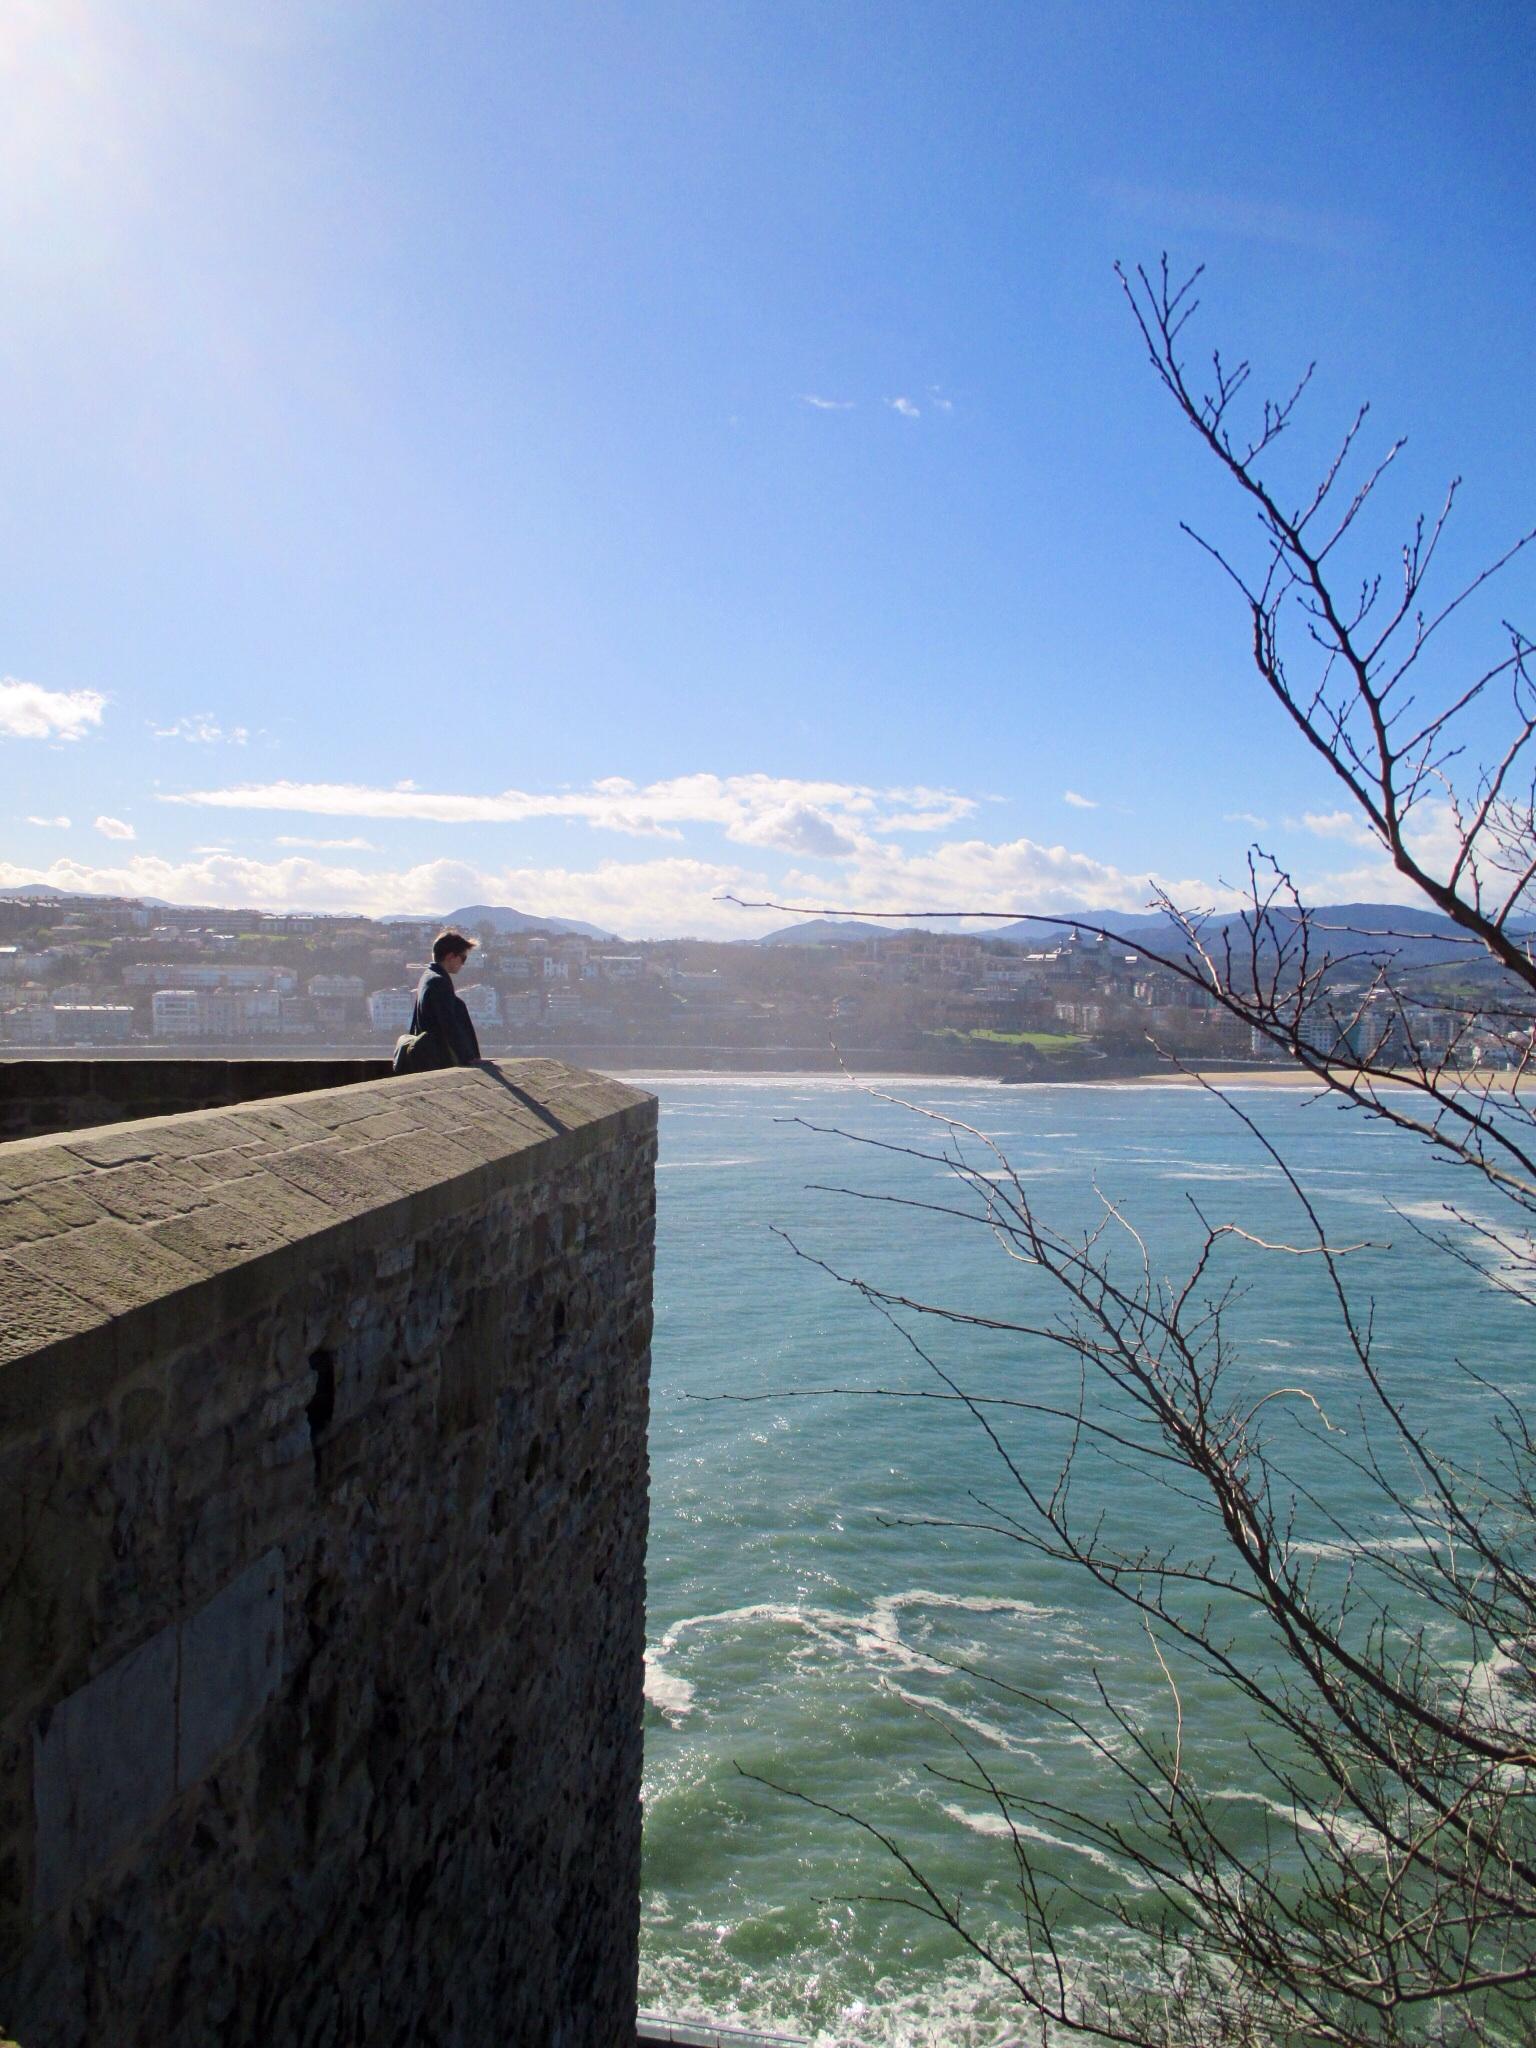 Samantha watching the waves crash onto the shoreline of San Sebastián